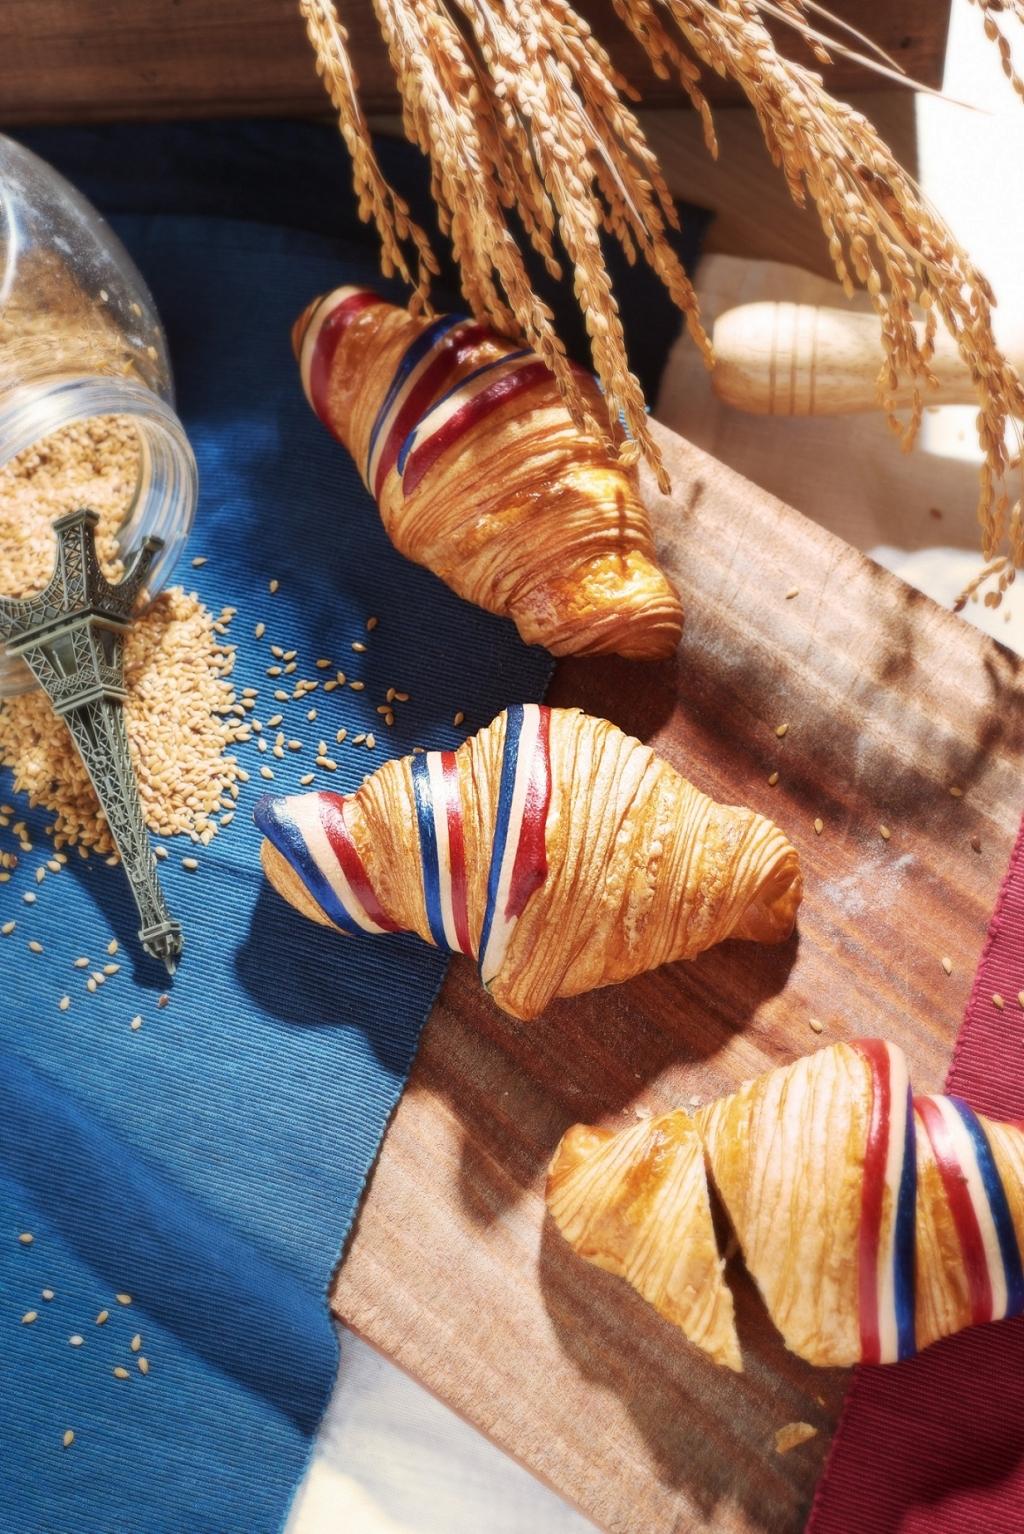 Gc每年7月14日單日限定獨賣的法國國旗原味可頌每個50元,7月3日起開放預購宅配